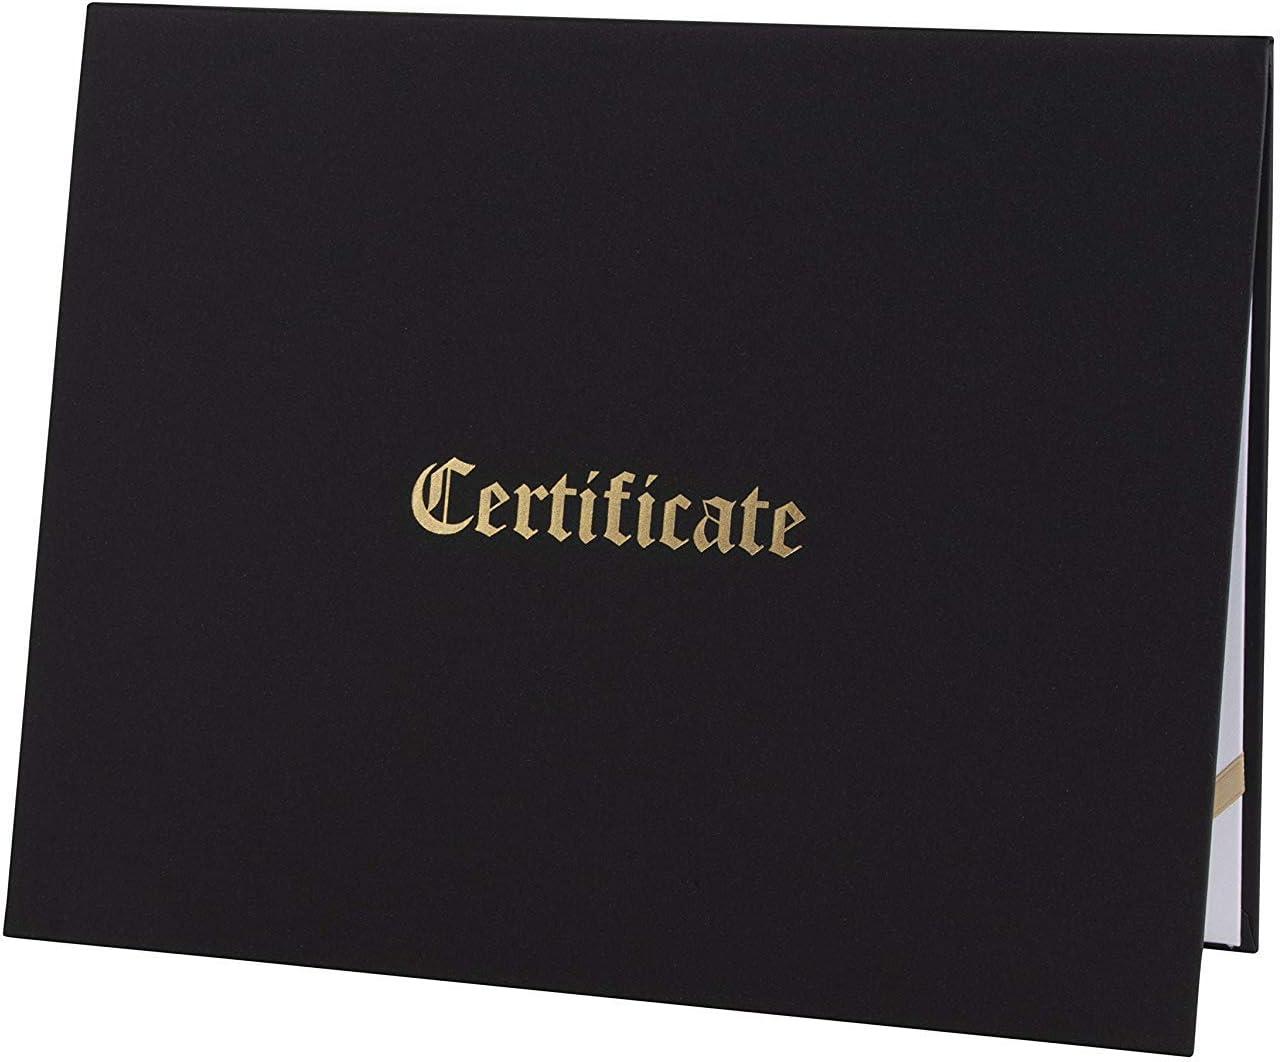 Pack de 12 soportes para certificados papel de aluminio dorado 29,2 x 20,8 cm funda para documentos para certificados de premio de tama/ño carta funda de diploma